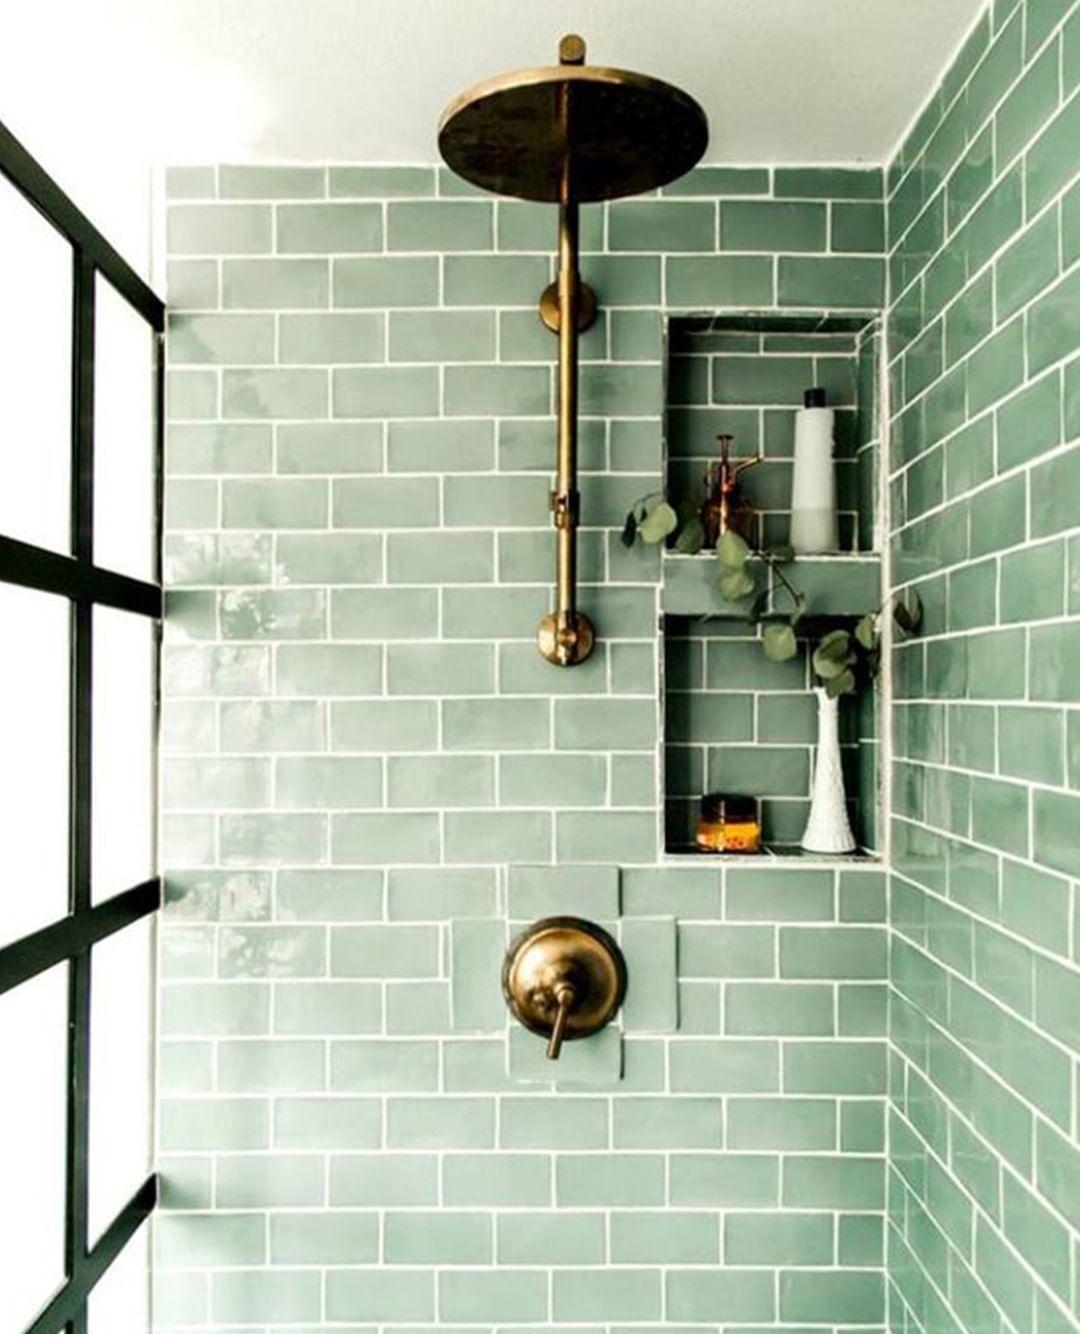 Jane Rockett On Instagram Beautiful Sage Green Bathroom Tiles Peaceful Relaxing Yet Stylish And Unique I In 2020 Green Tile Bathroom Green Bathroom Tile Bathroom